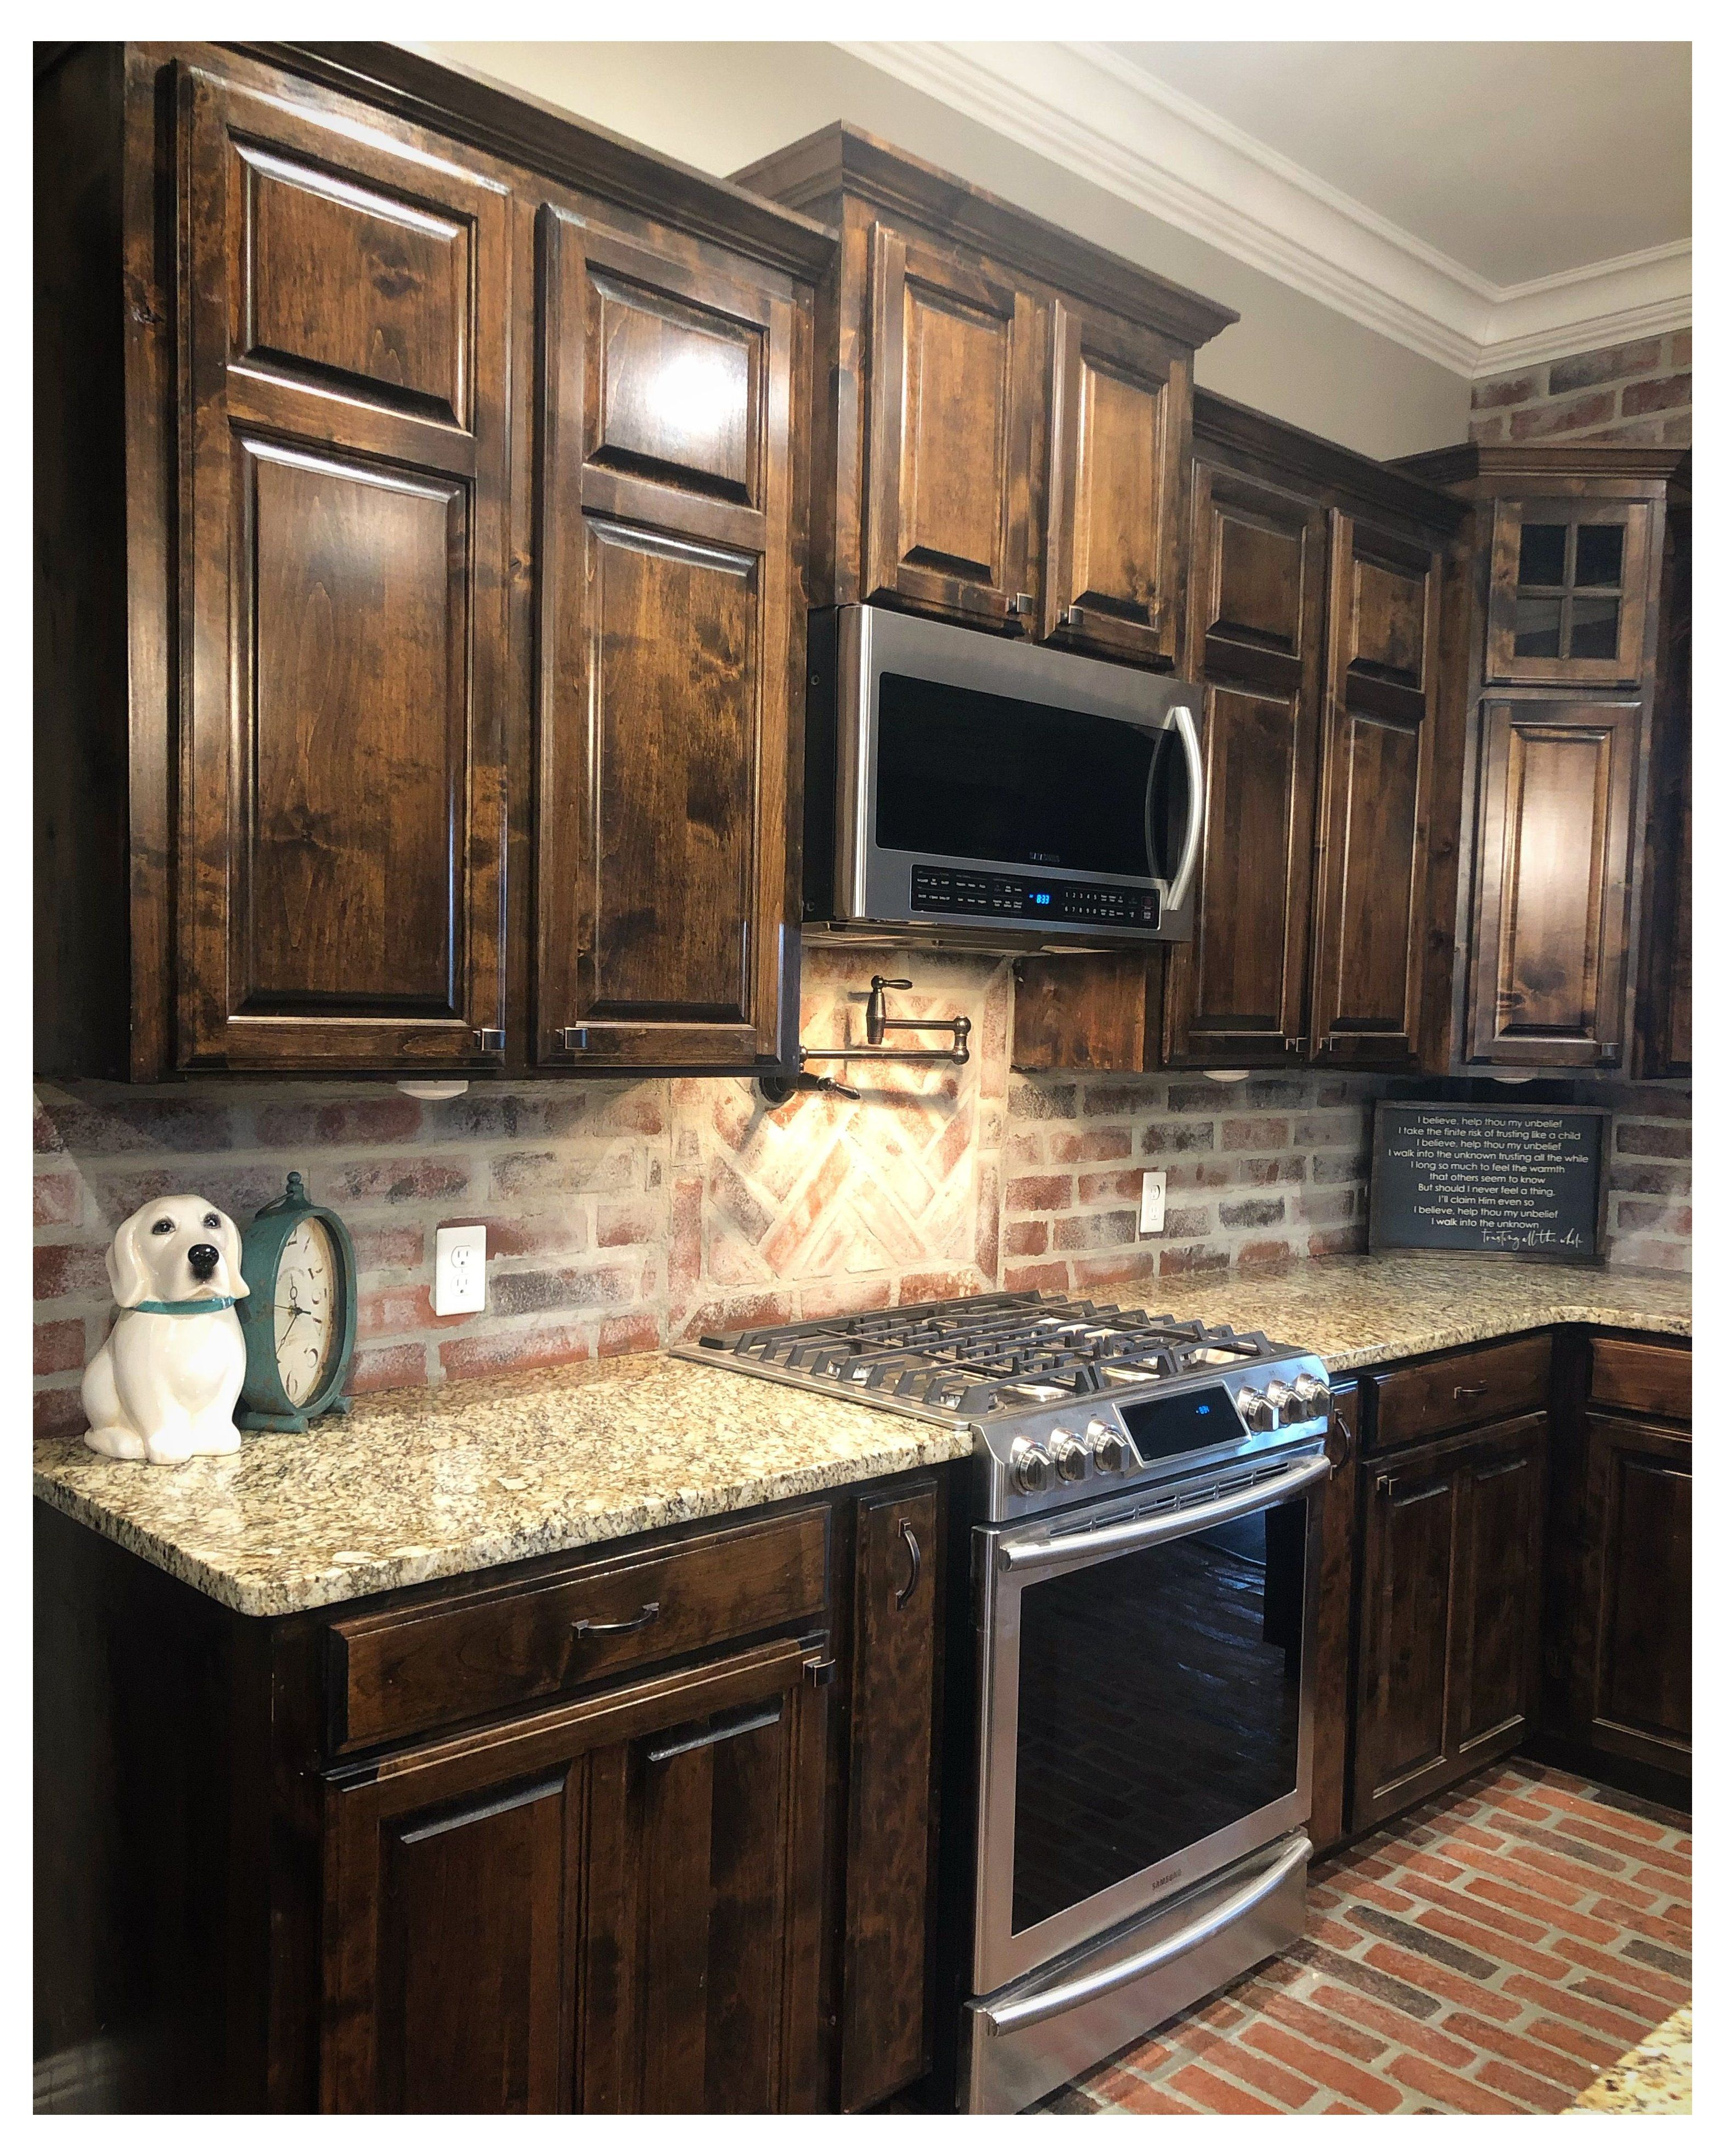 Pin By Leslie Bautista On House Ideas In 2020 Stained Kitchen Cabinets Dark Wood Kitchen Cabinets Backsplash Kitchen Dark Cabinets